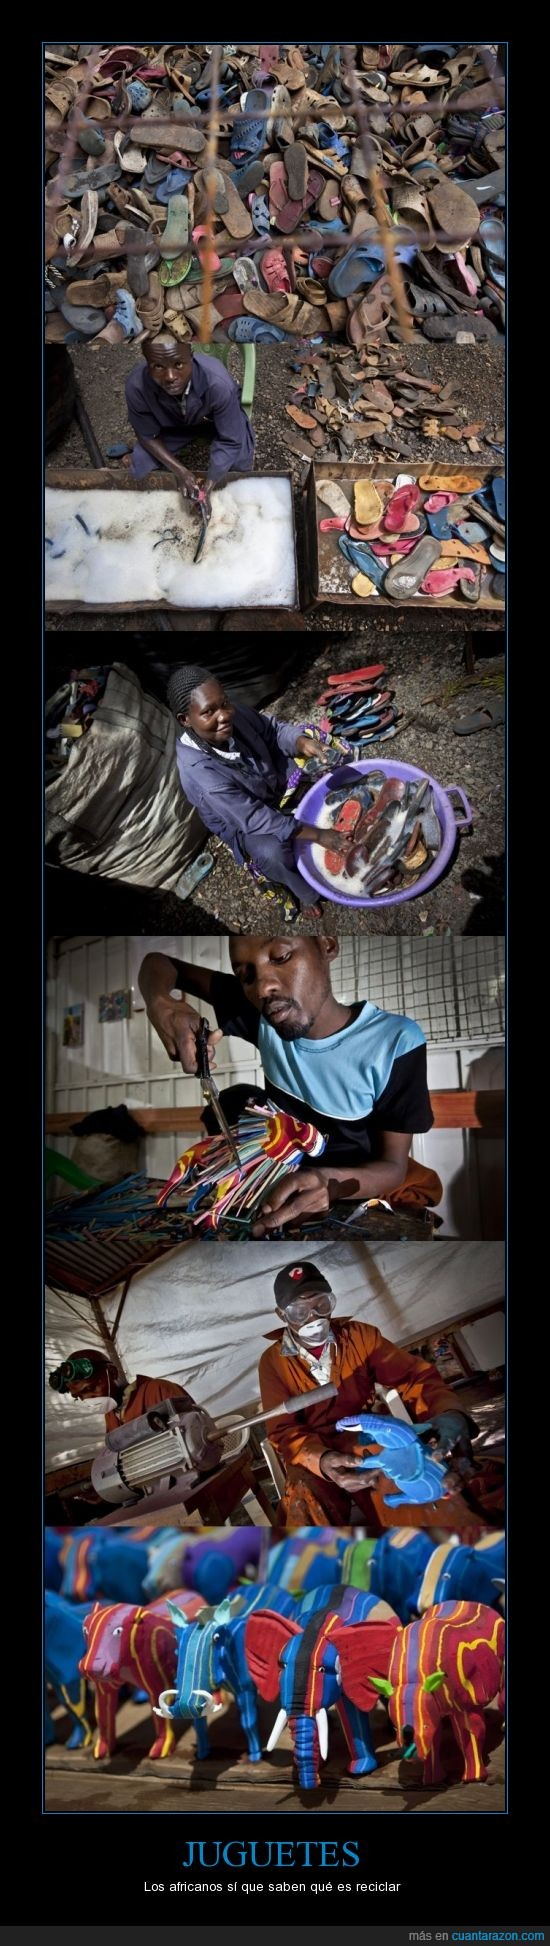 africa,juguetes,reciclaje,sandalias